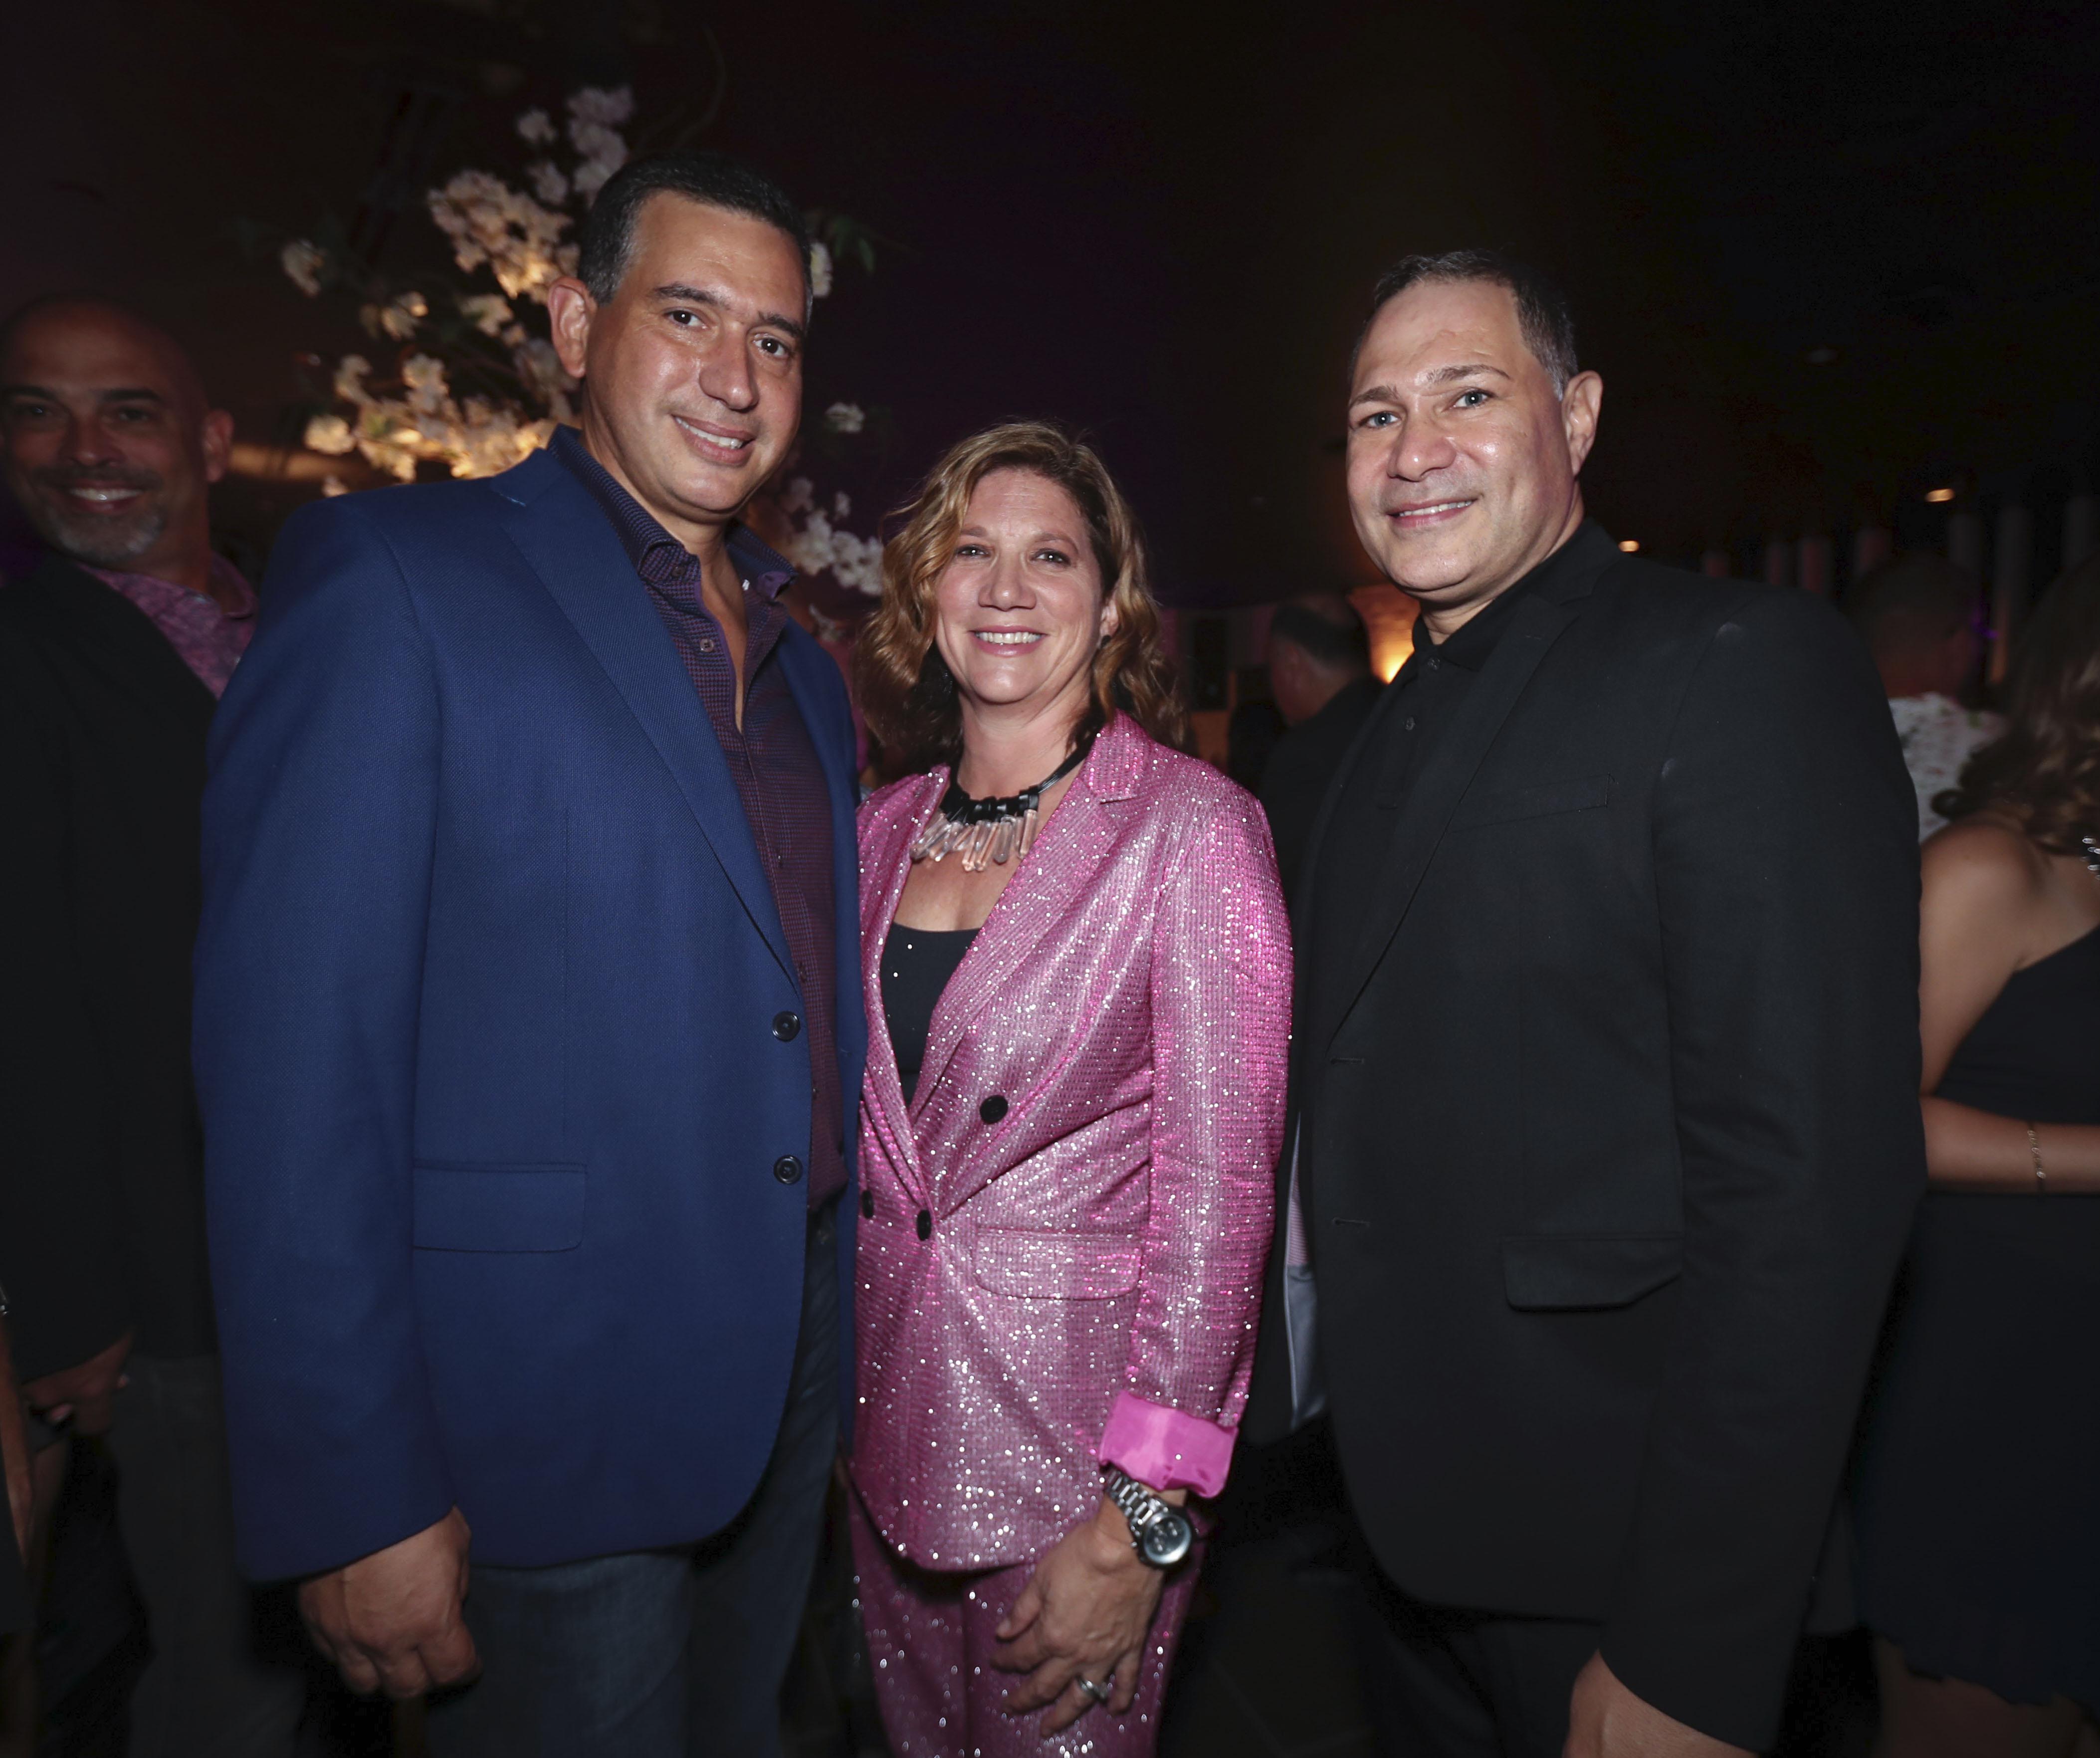 José M. Suárez, Rita Garay y Ricky Díaz. (Suministrada)